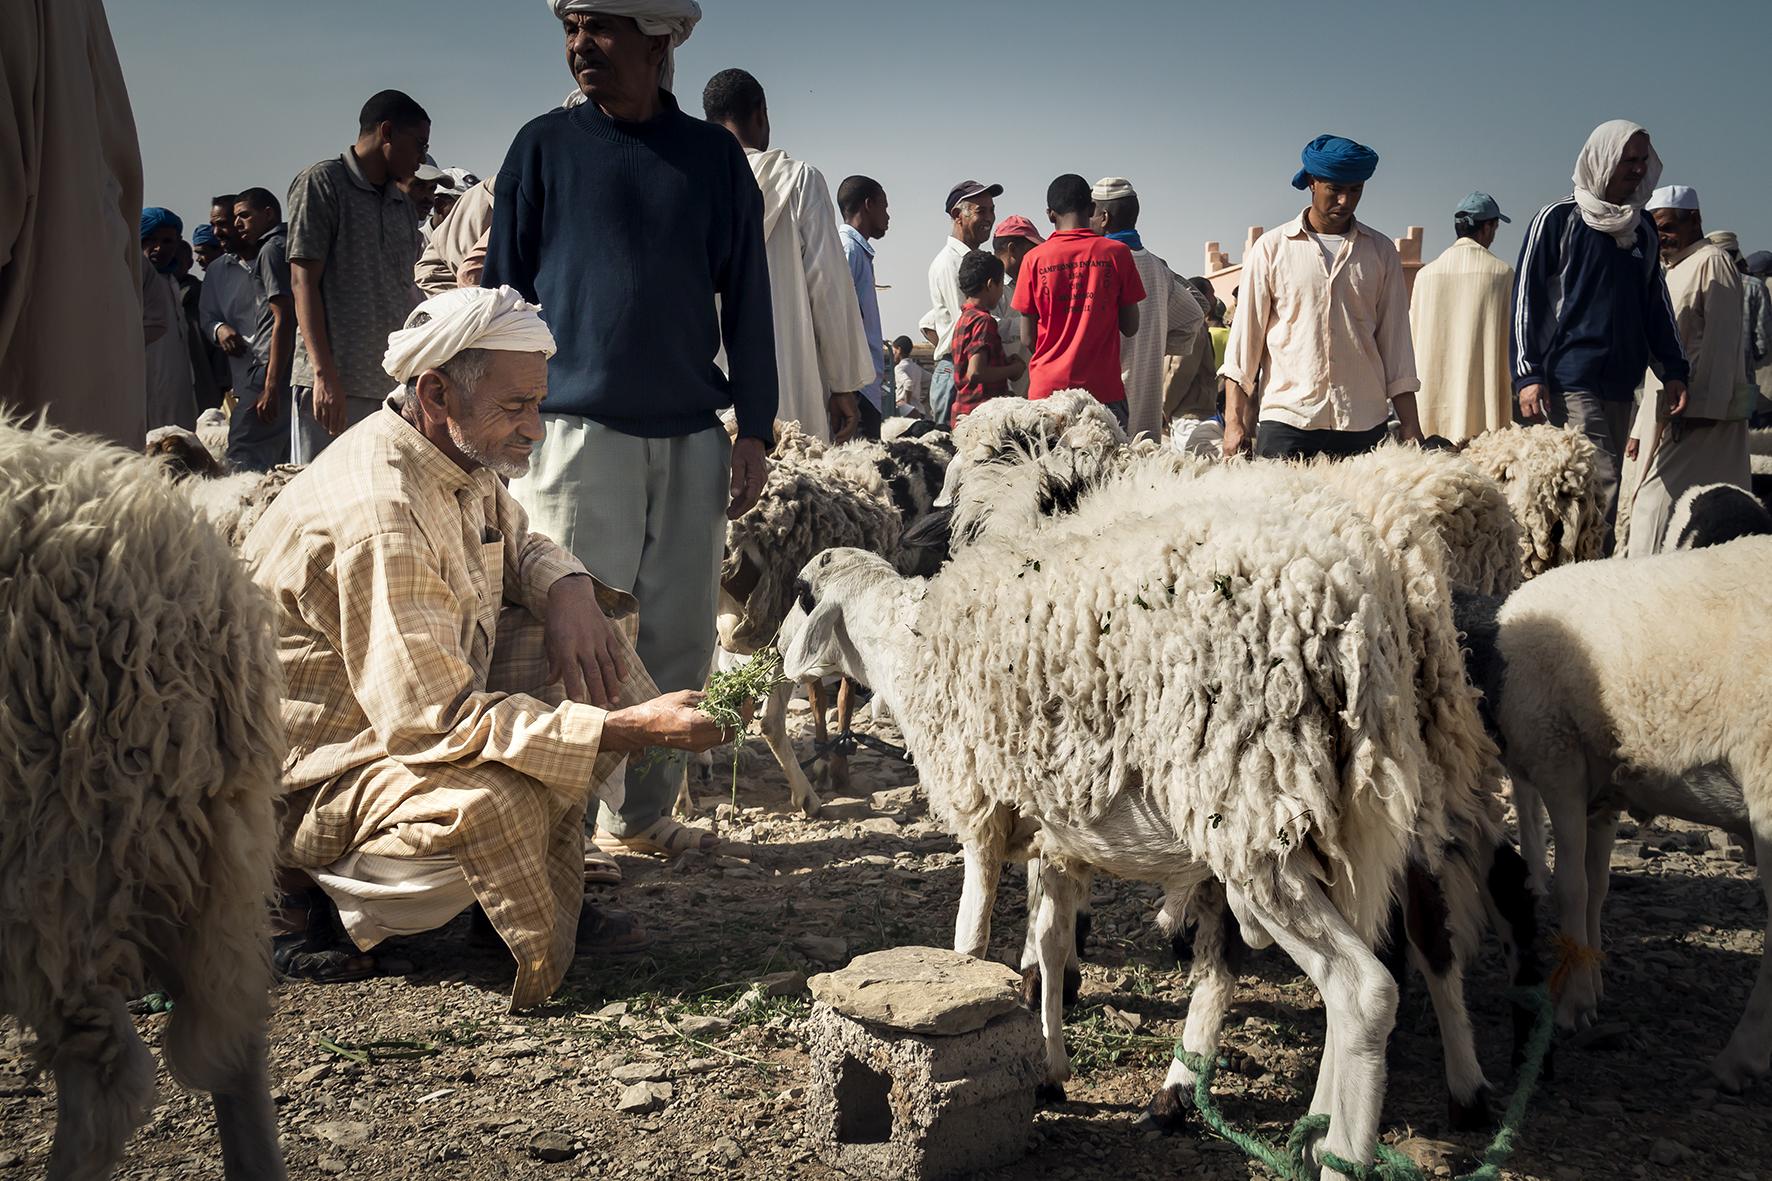 Marroco | Africa | sheep merchant